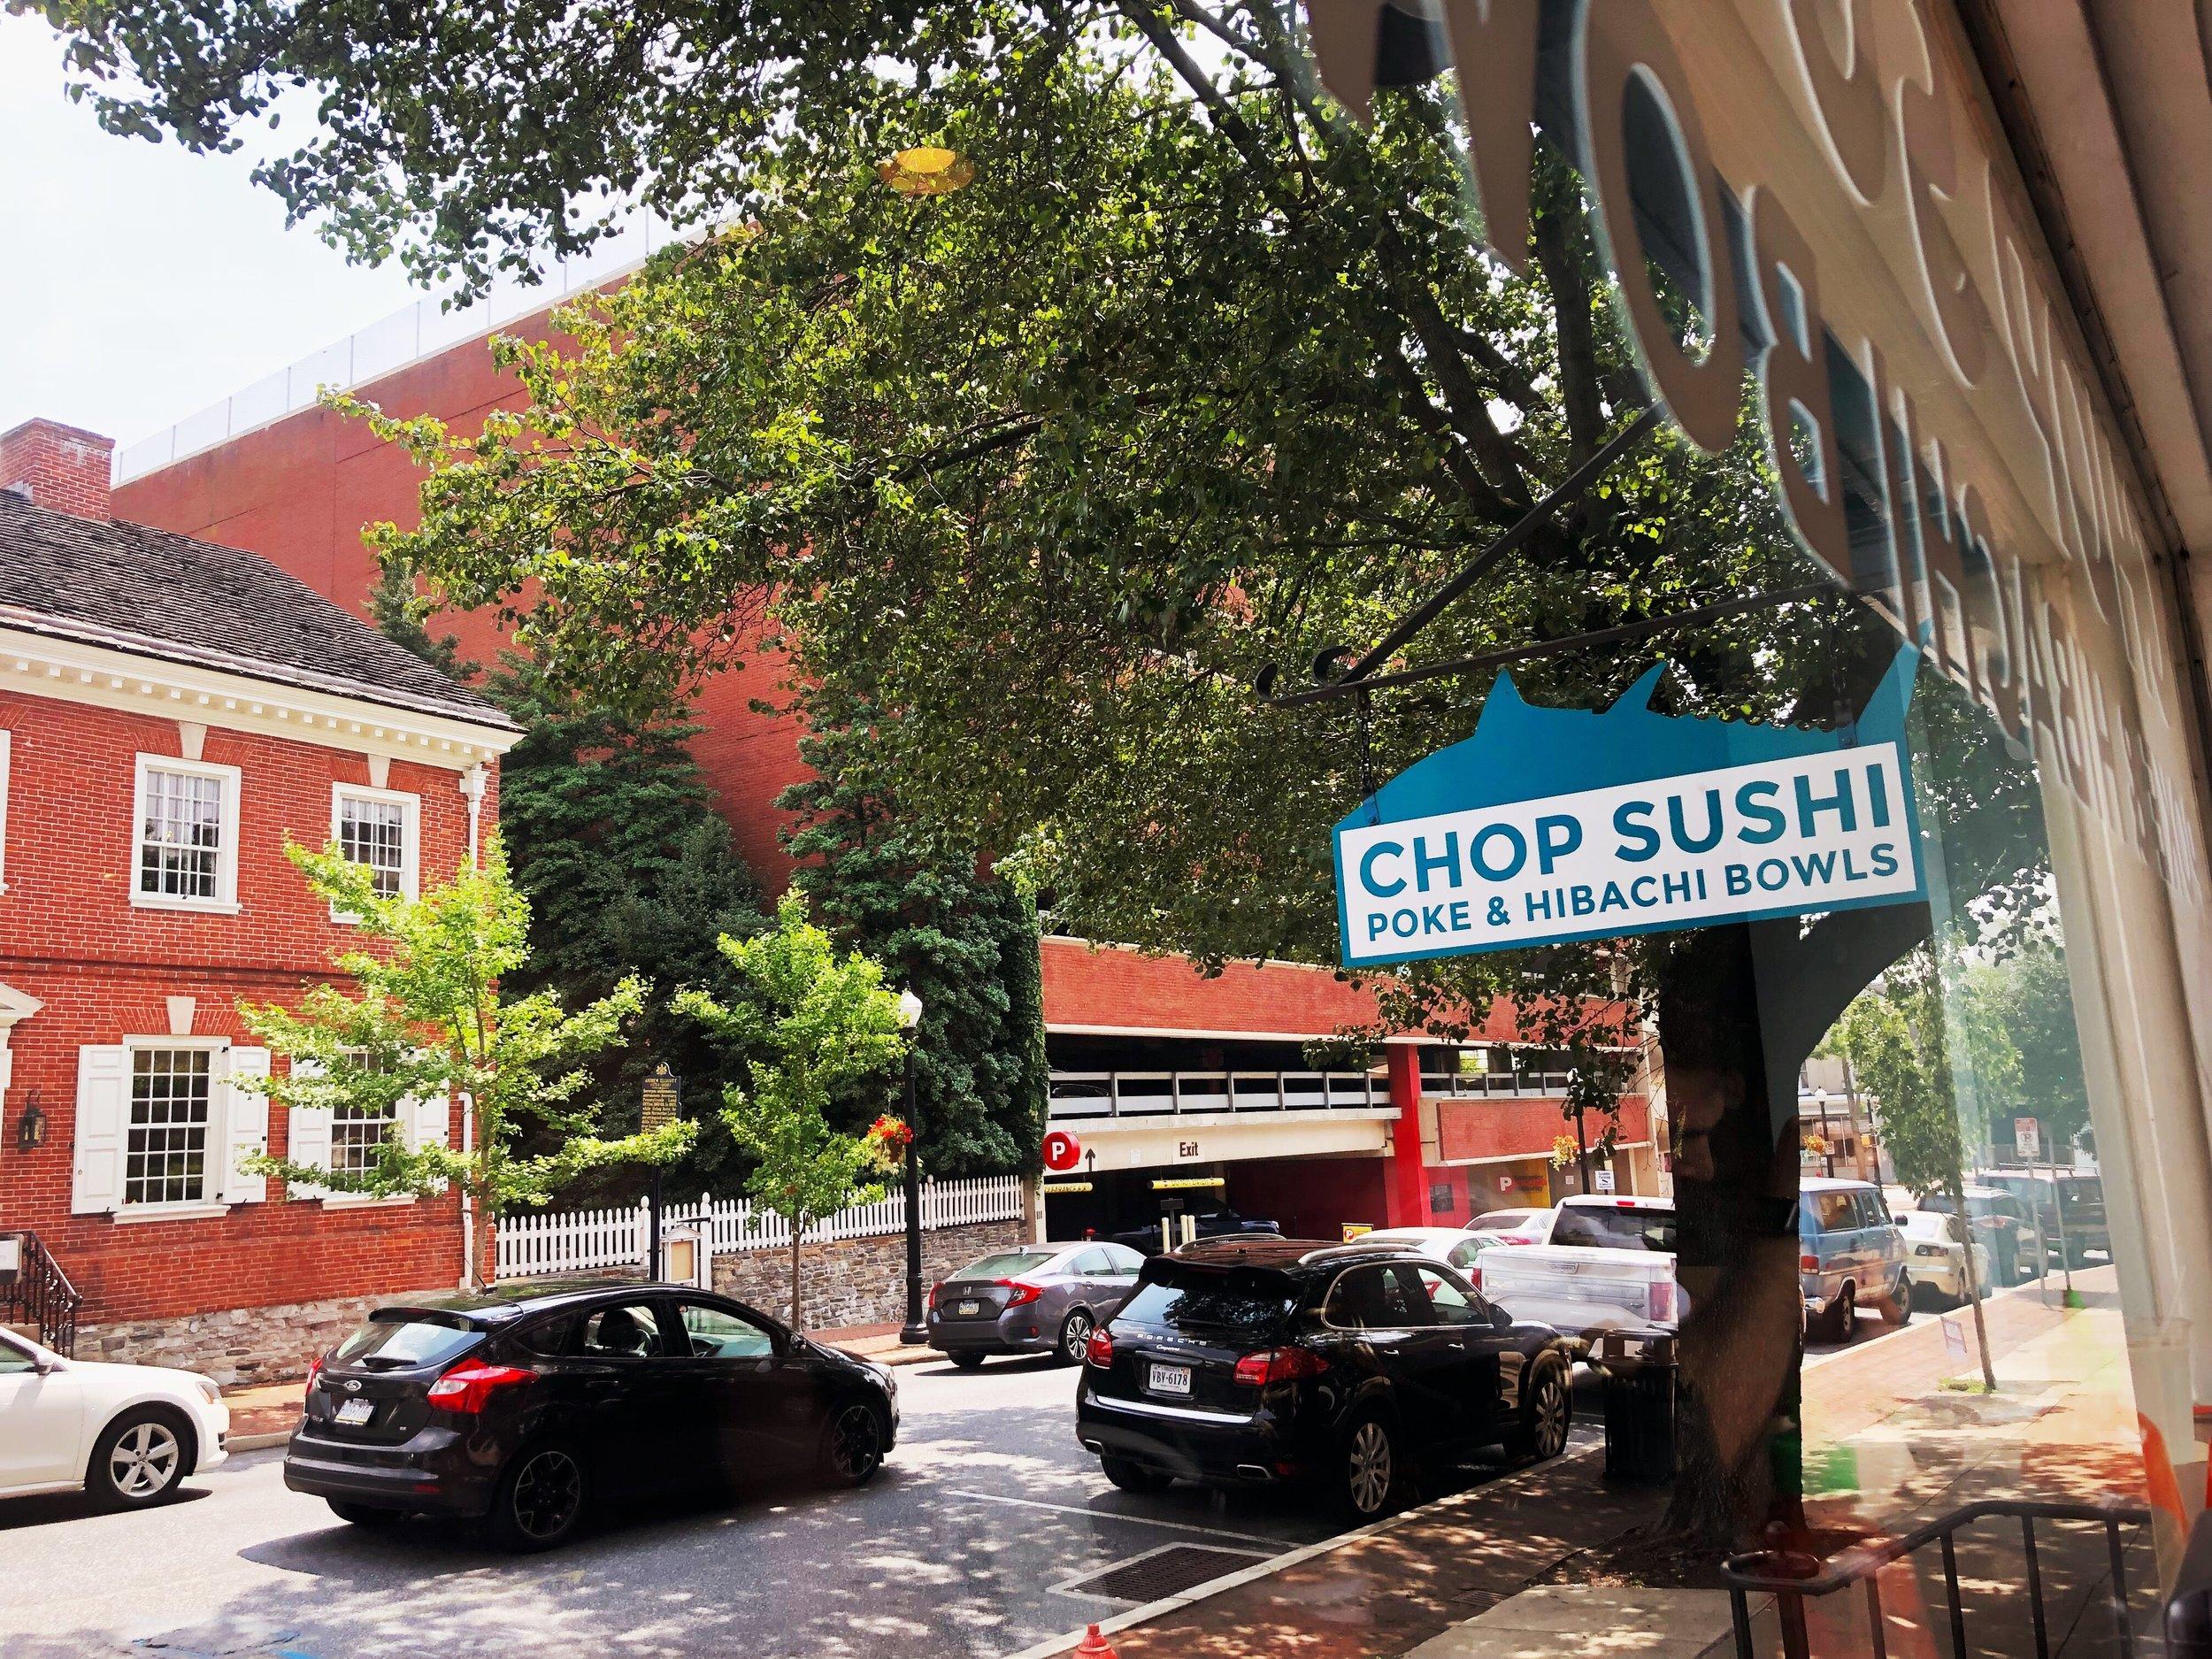 Chop Sushi - Poke bowls for lunch!